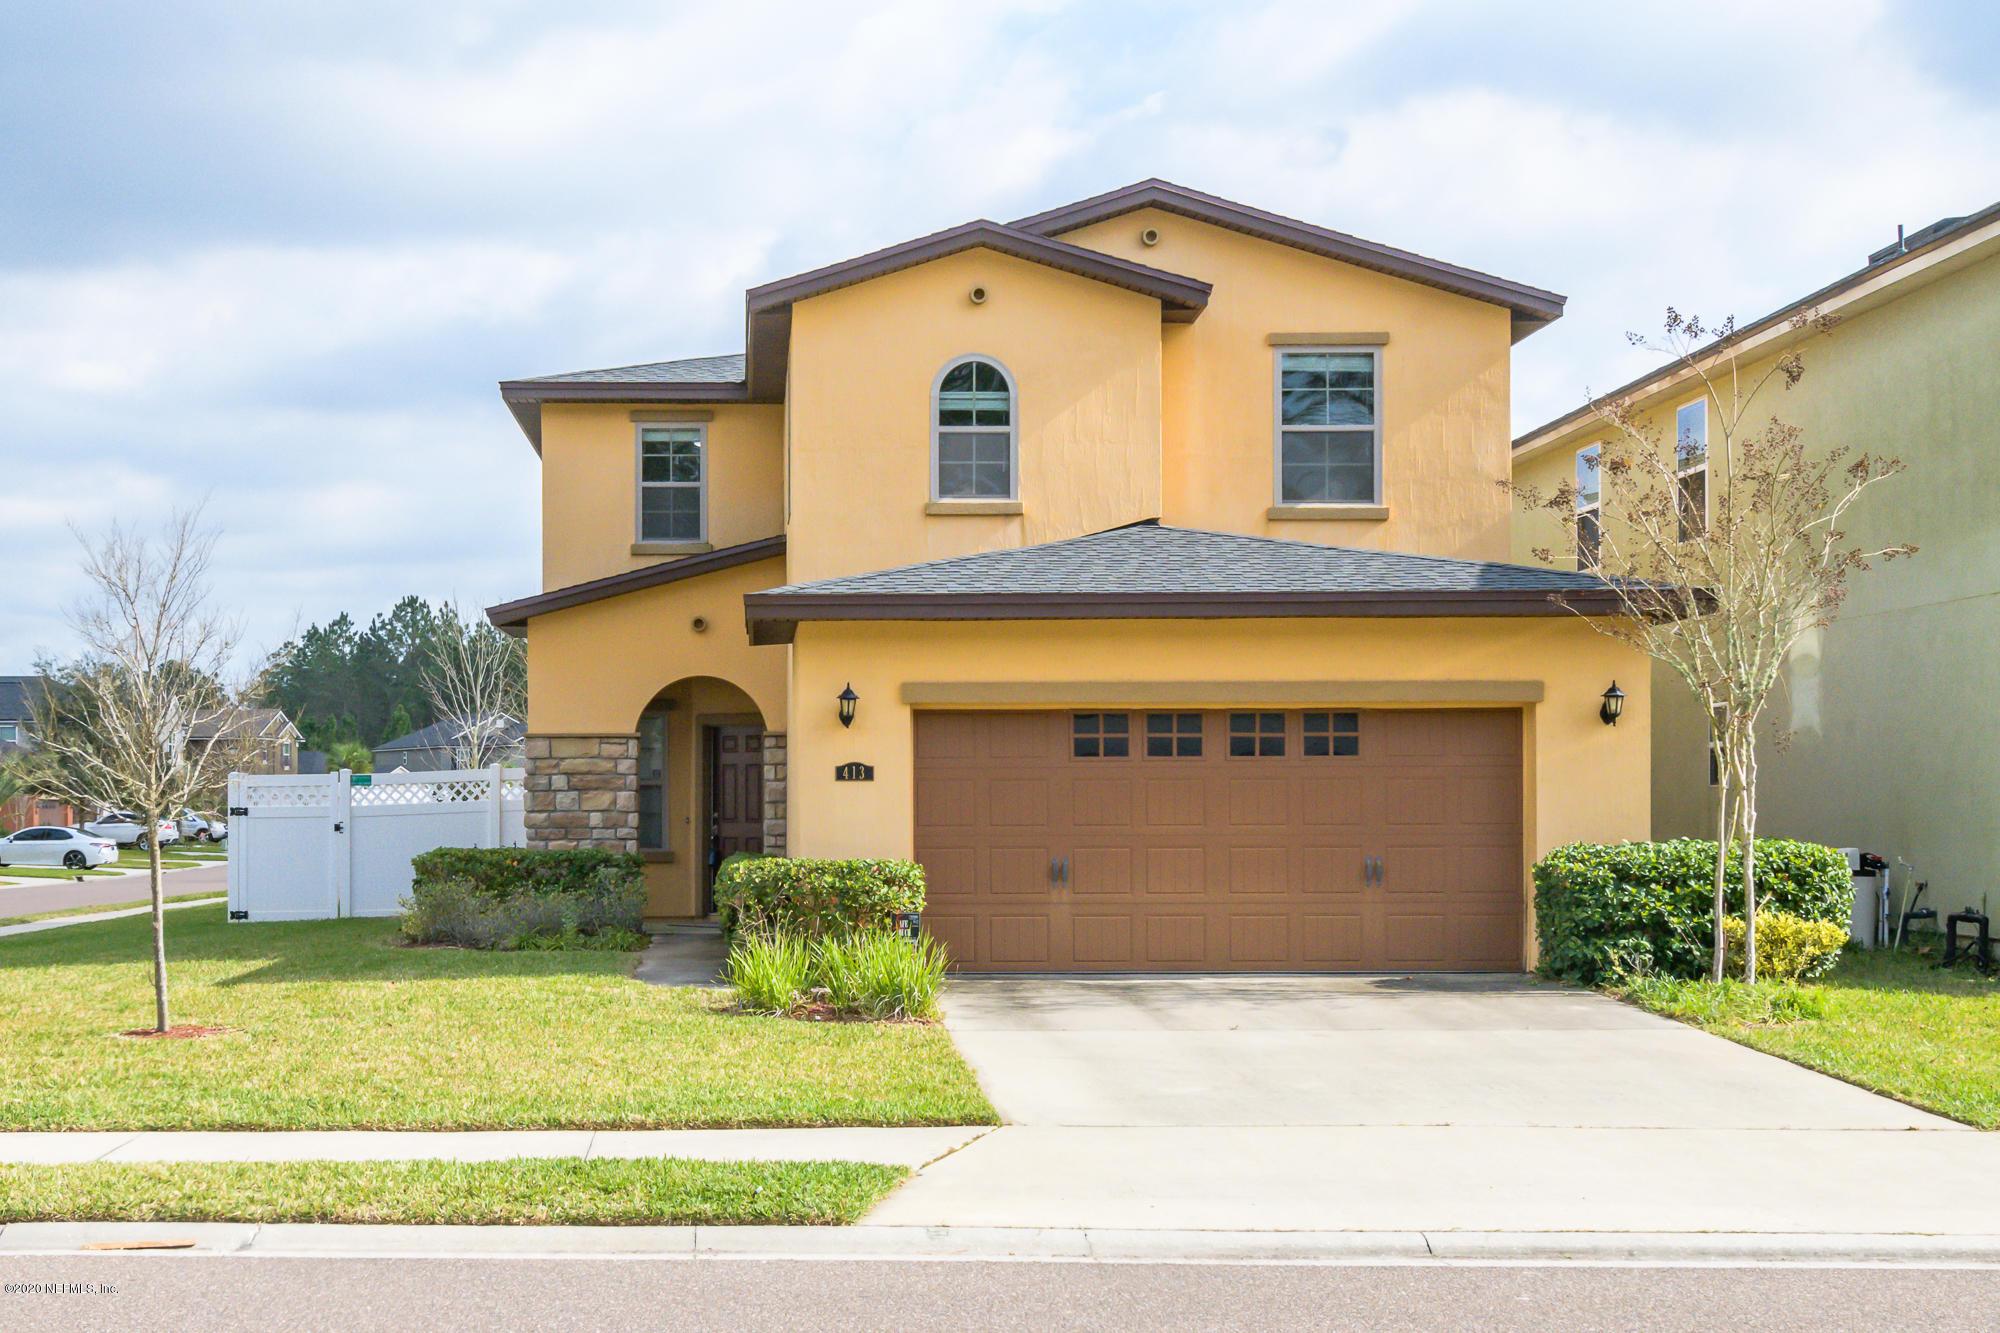 413 FOREST MEADOW, ORANGE PARK, FLORIDA 32065, 4 Bedrooms Bedrooms, ,2 BathroomsBathrooms,Rental,For sale,FOREST MEADOW,1033874